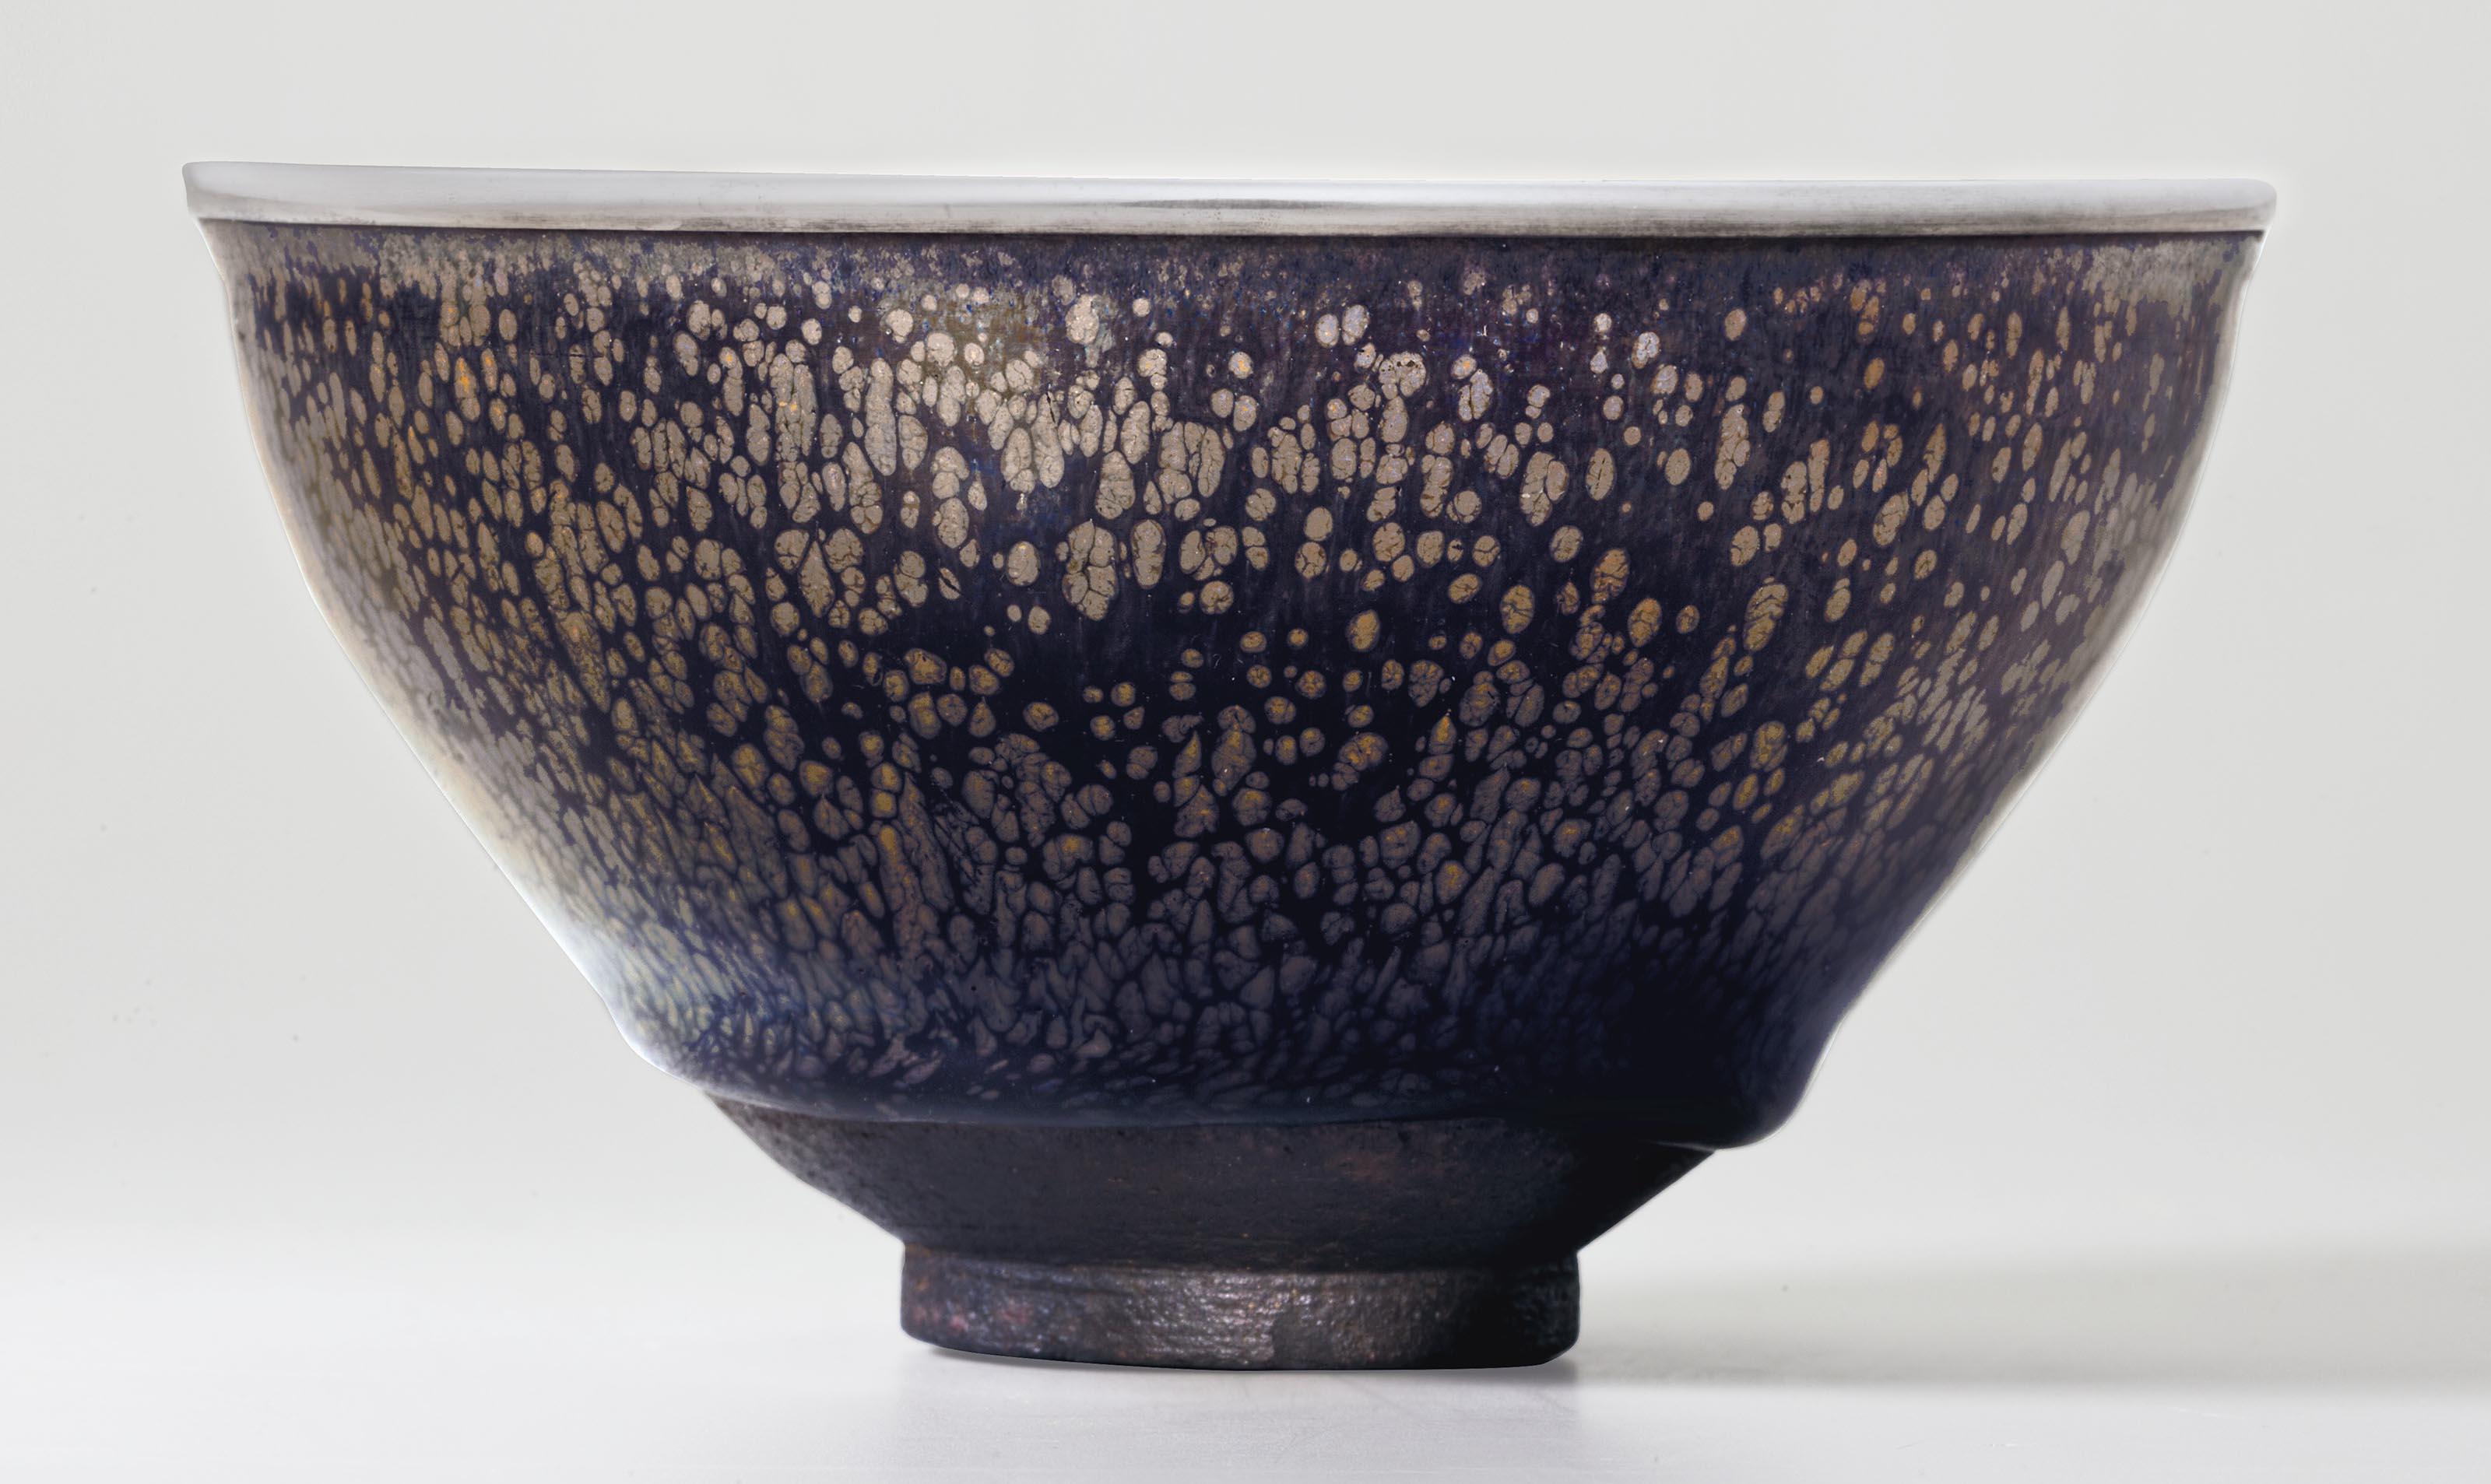 THE KURODA FAMILY YUTEKI TENMOKU A HIGHLY IMPORTANT AND VERY RARE 'OIL SPOT' JIAN TEA BOWL